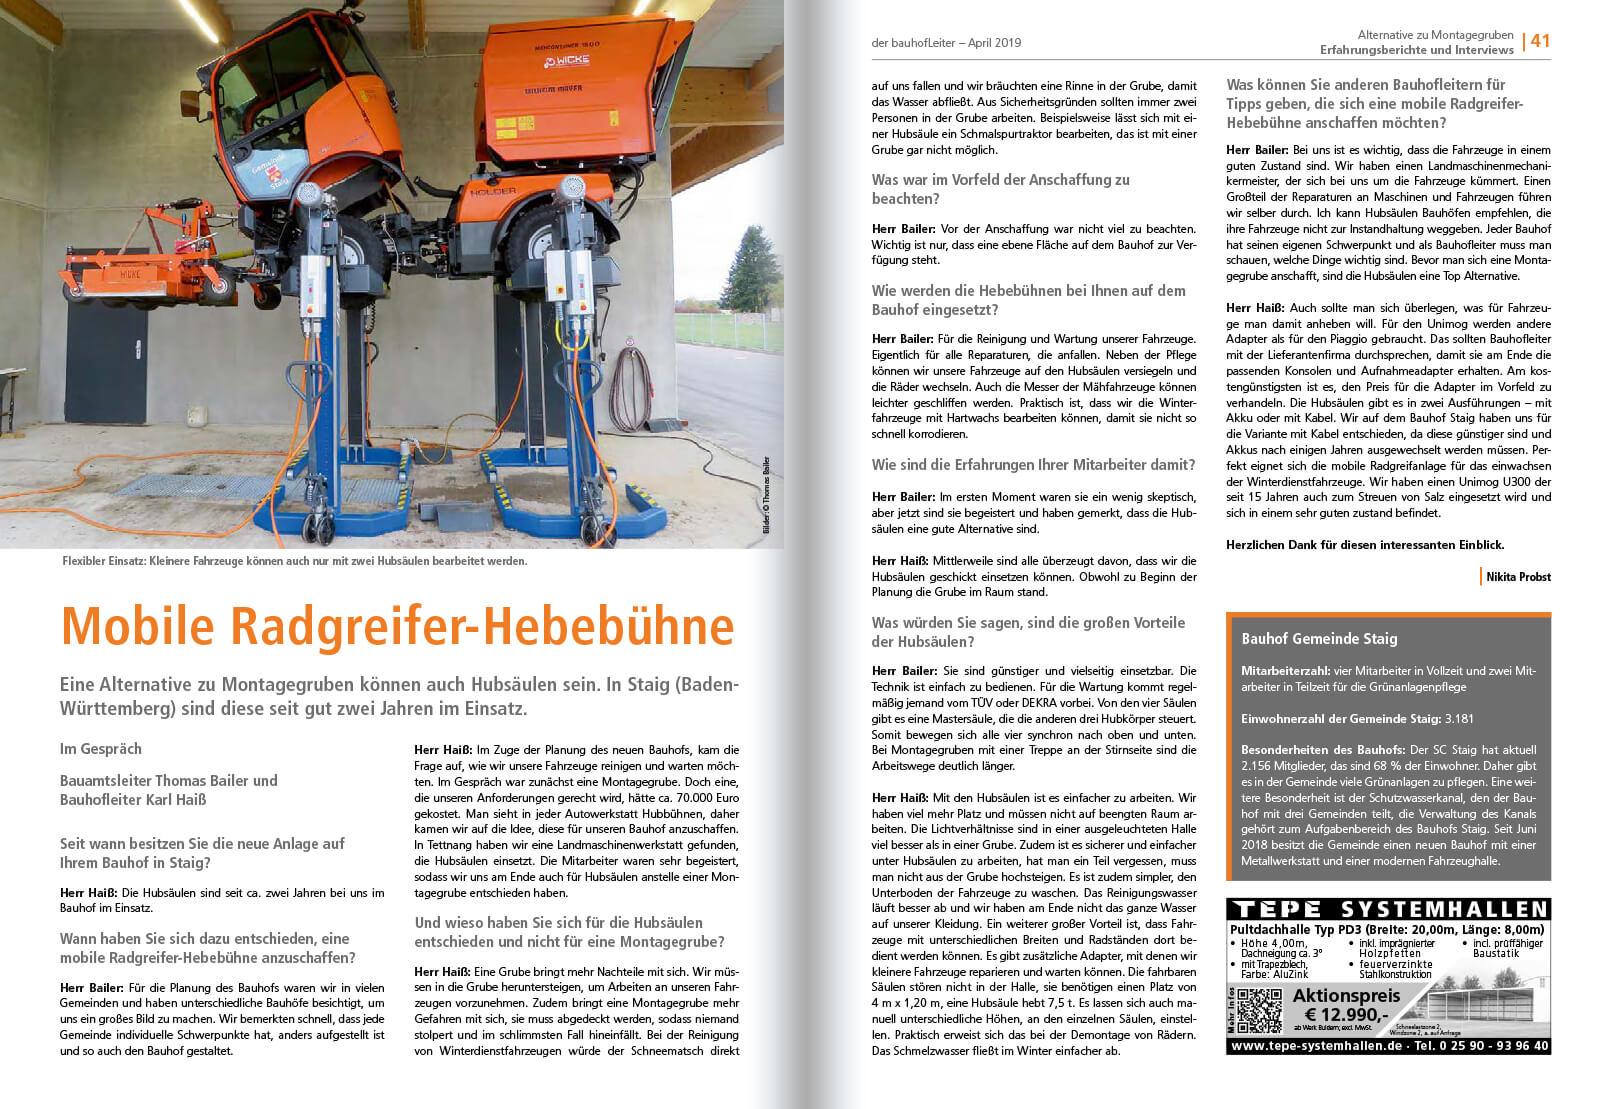 2019-04 Mobile Radgreifer Hebebühne